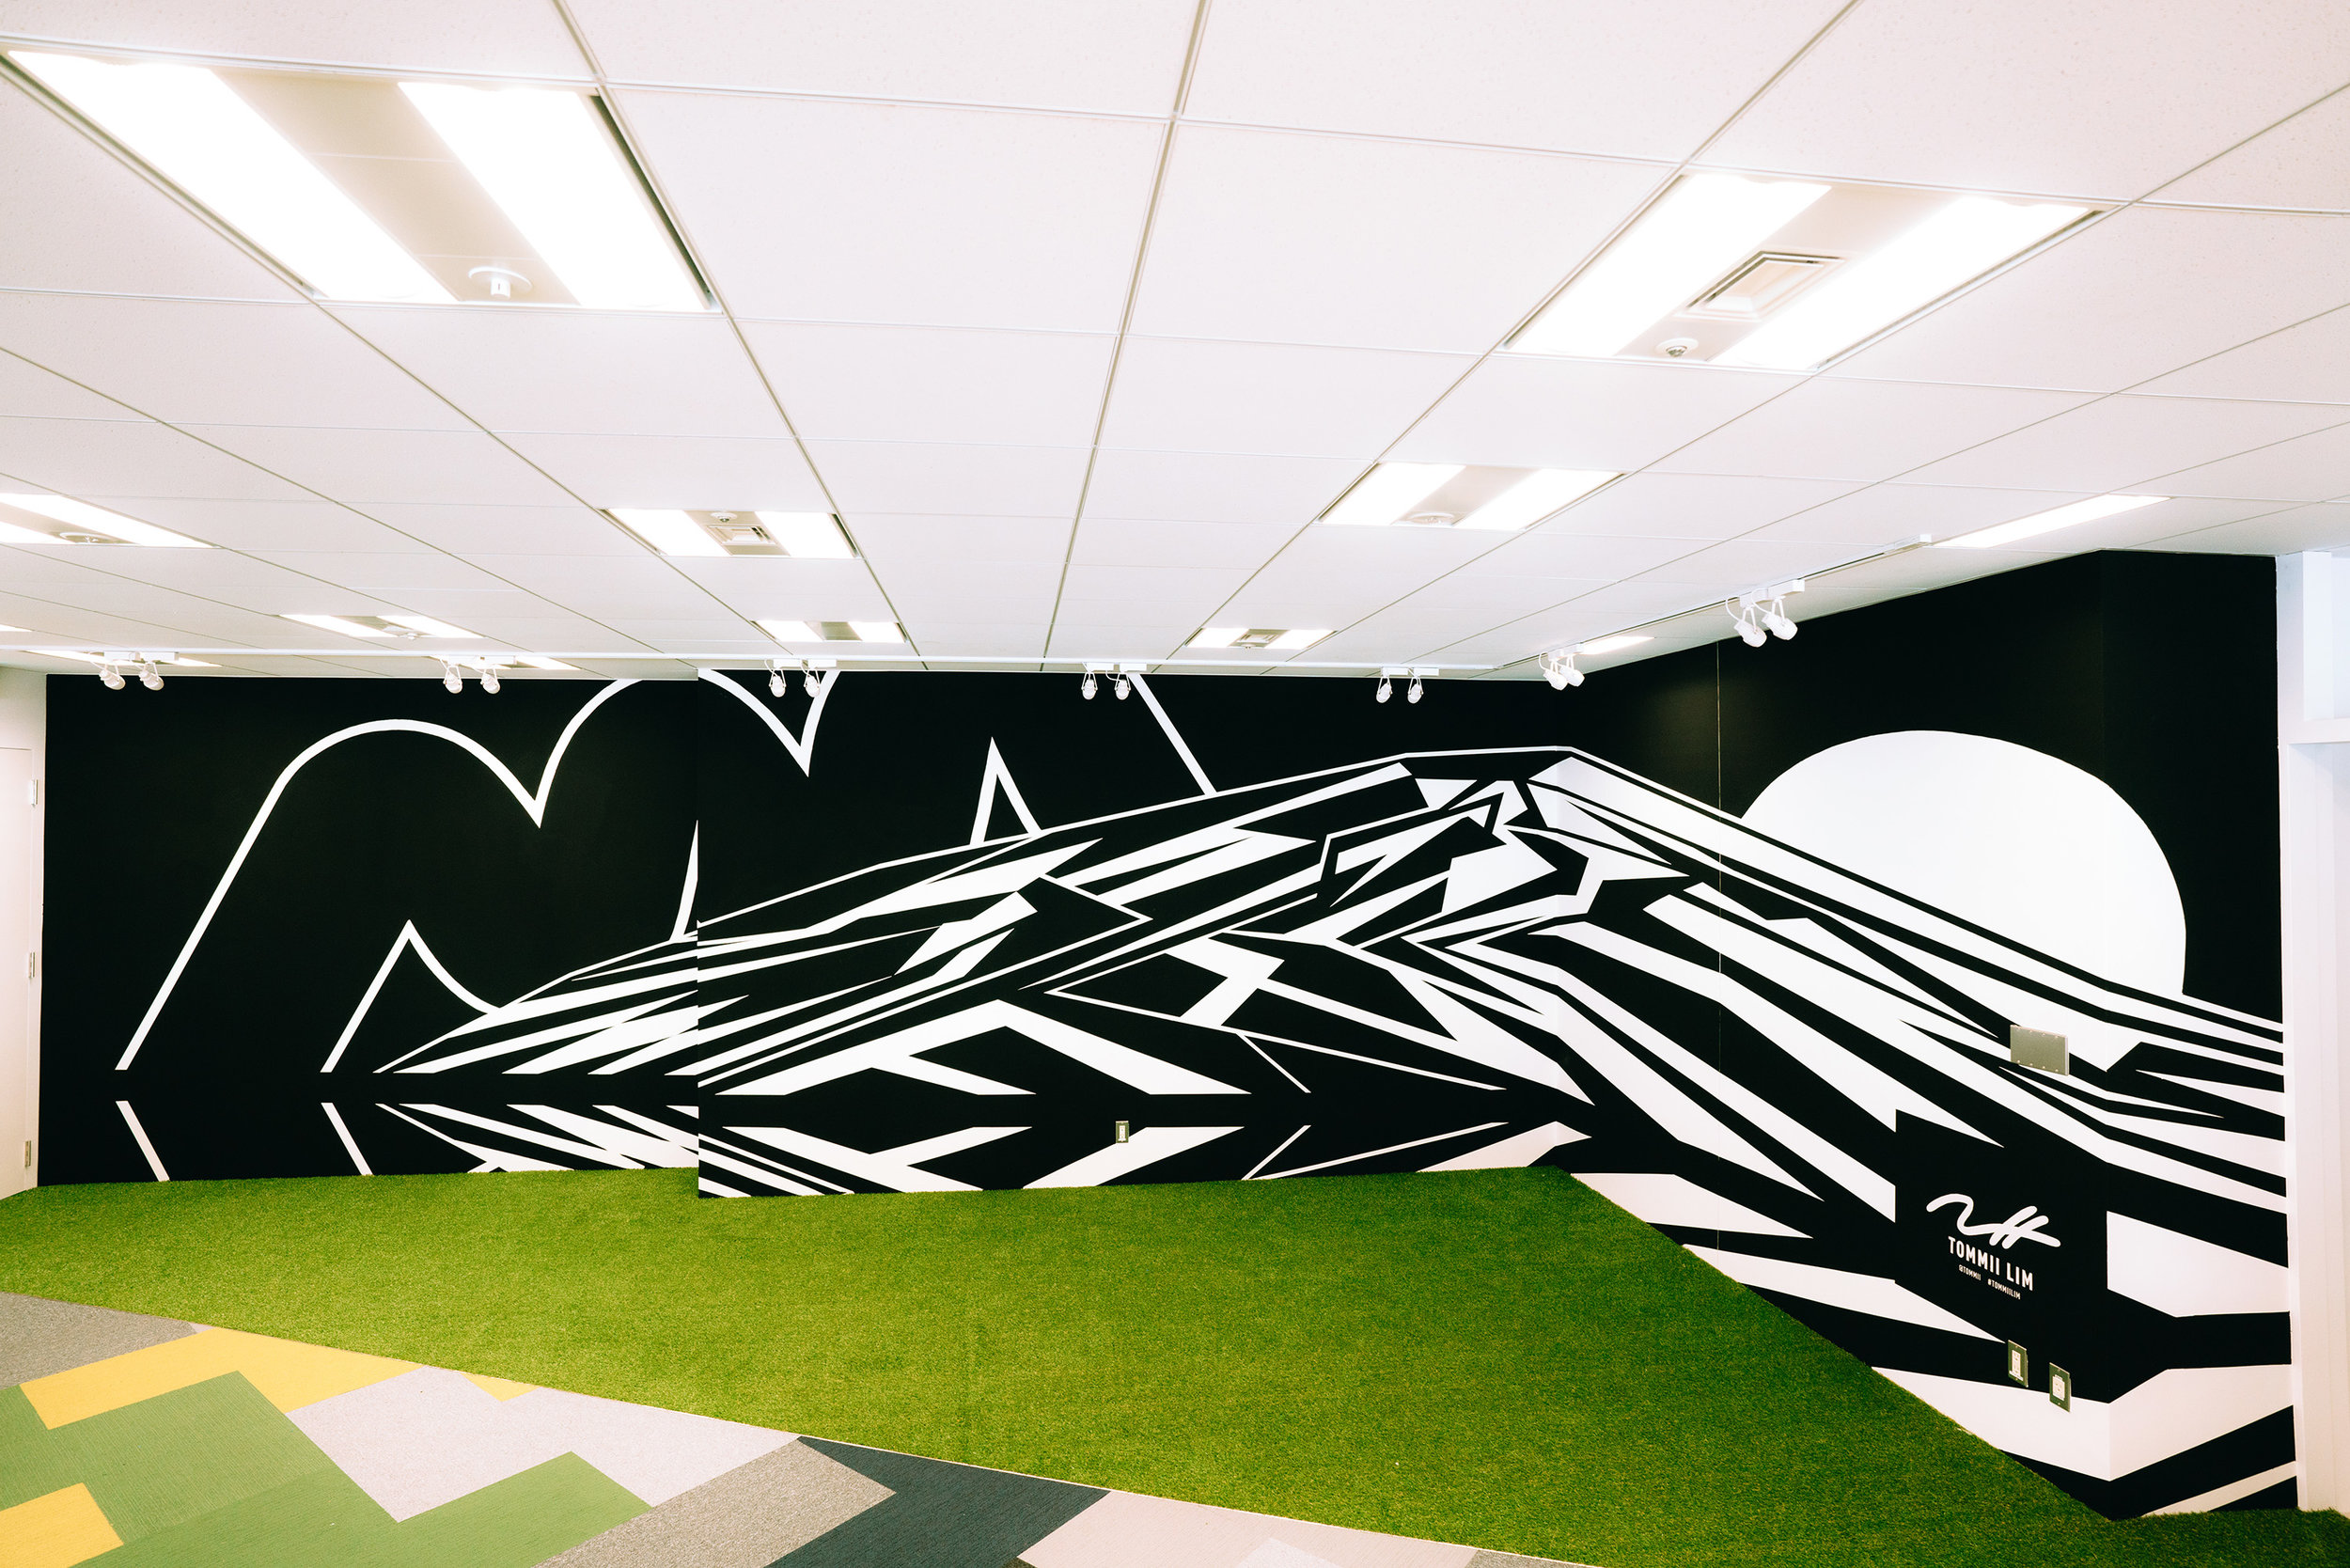 mark lona mural japan-5.jpg